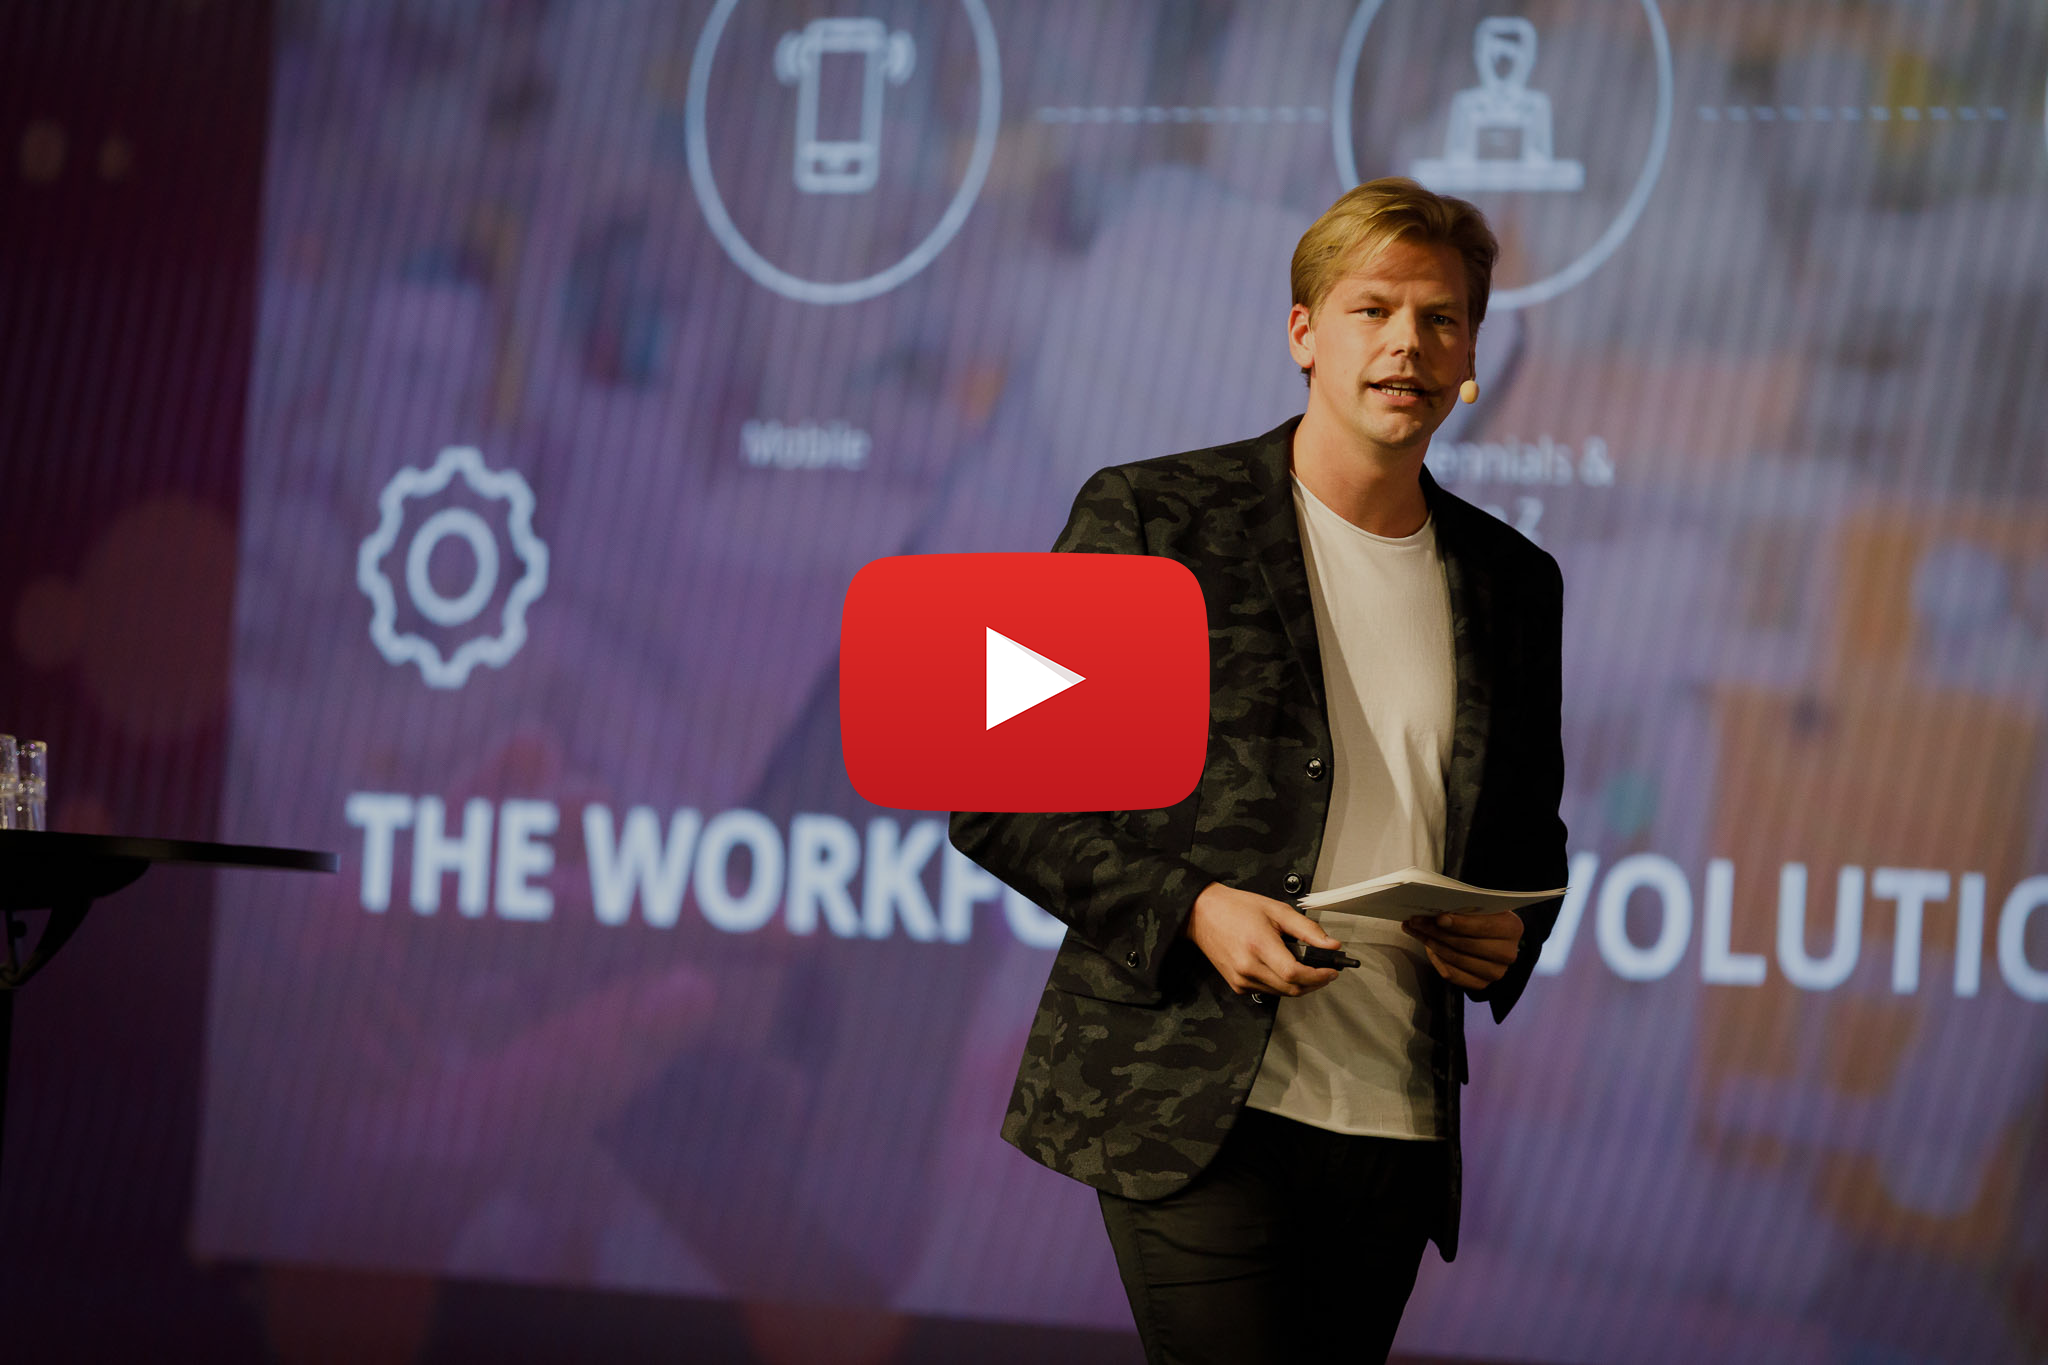 Presentations wfm day 2018 all videos